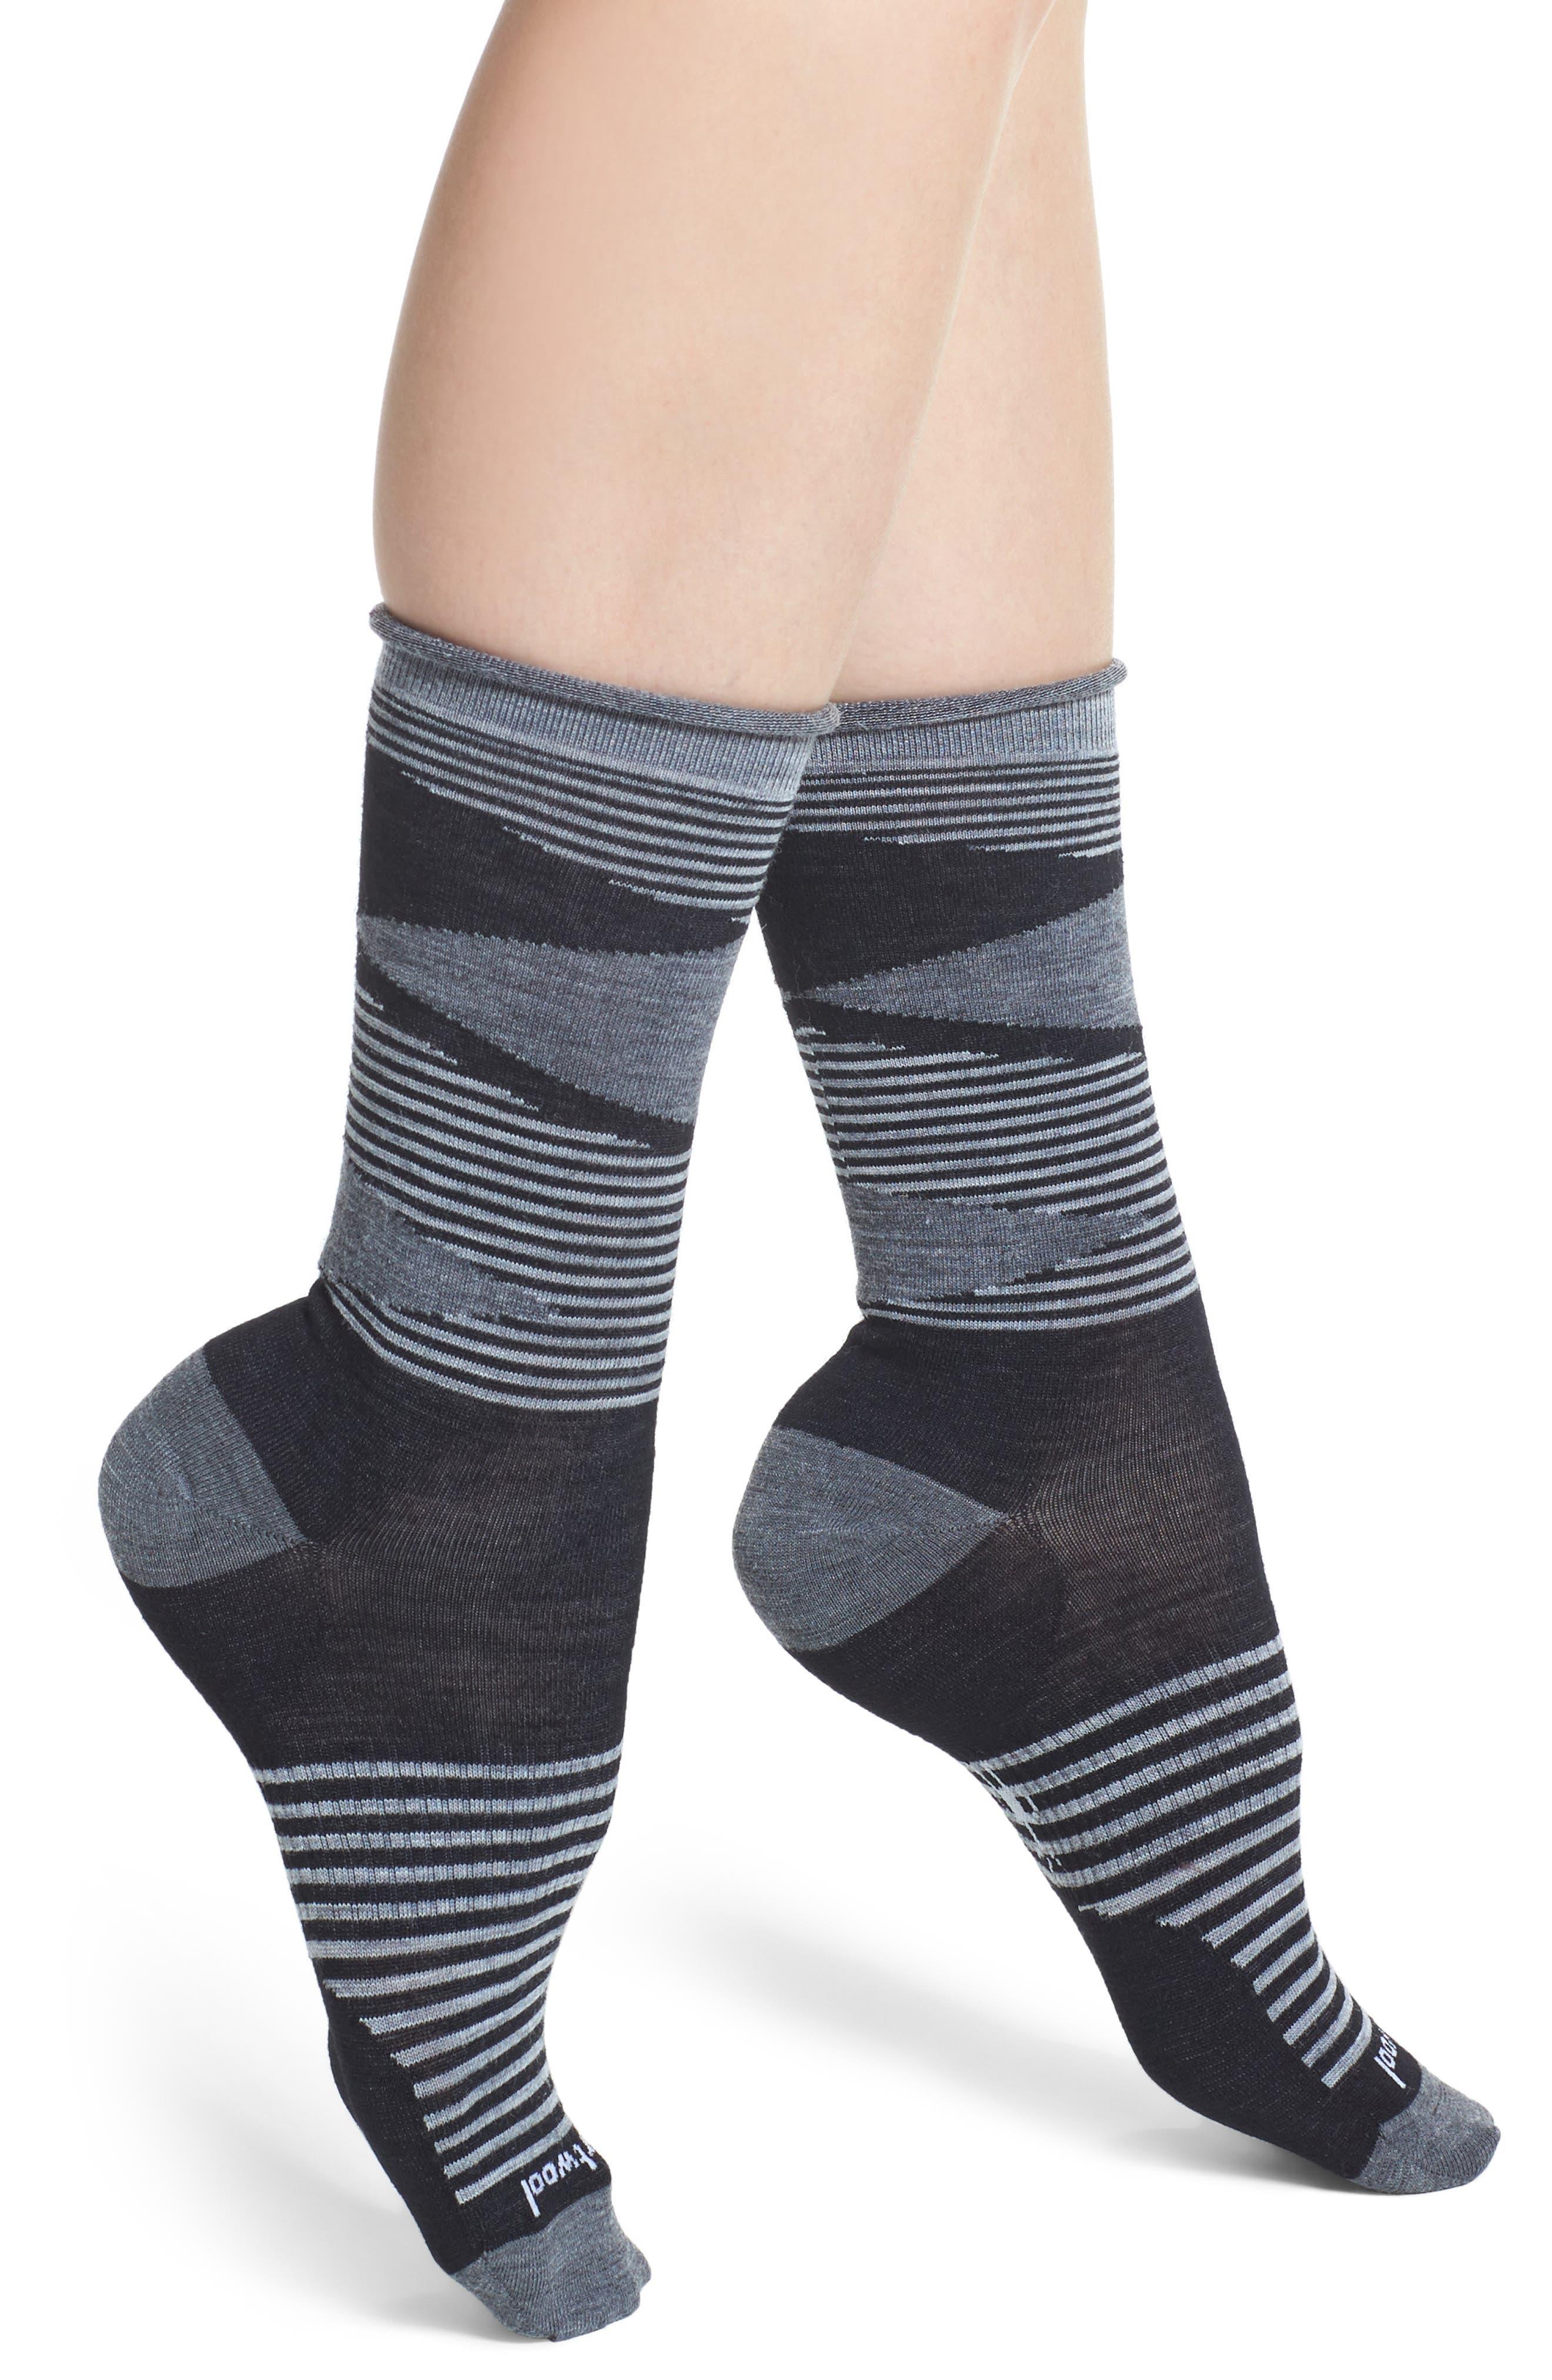 Smartwool First Mate Crew Socks